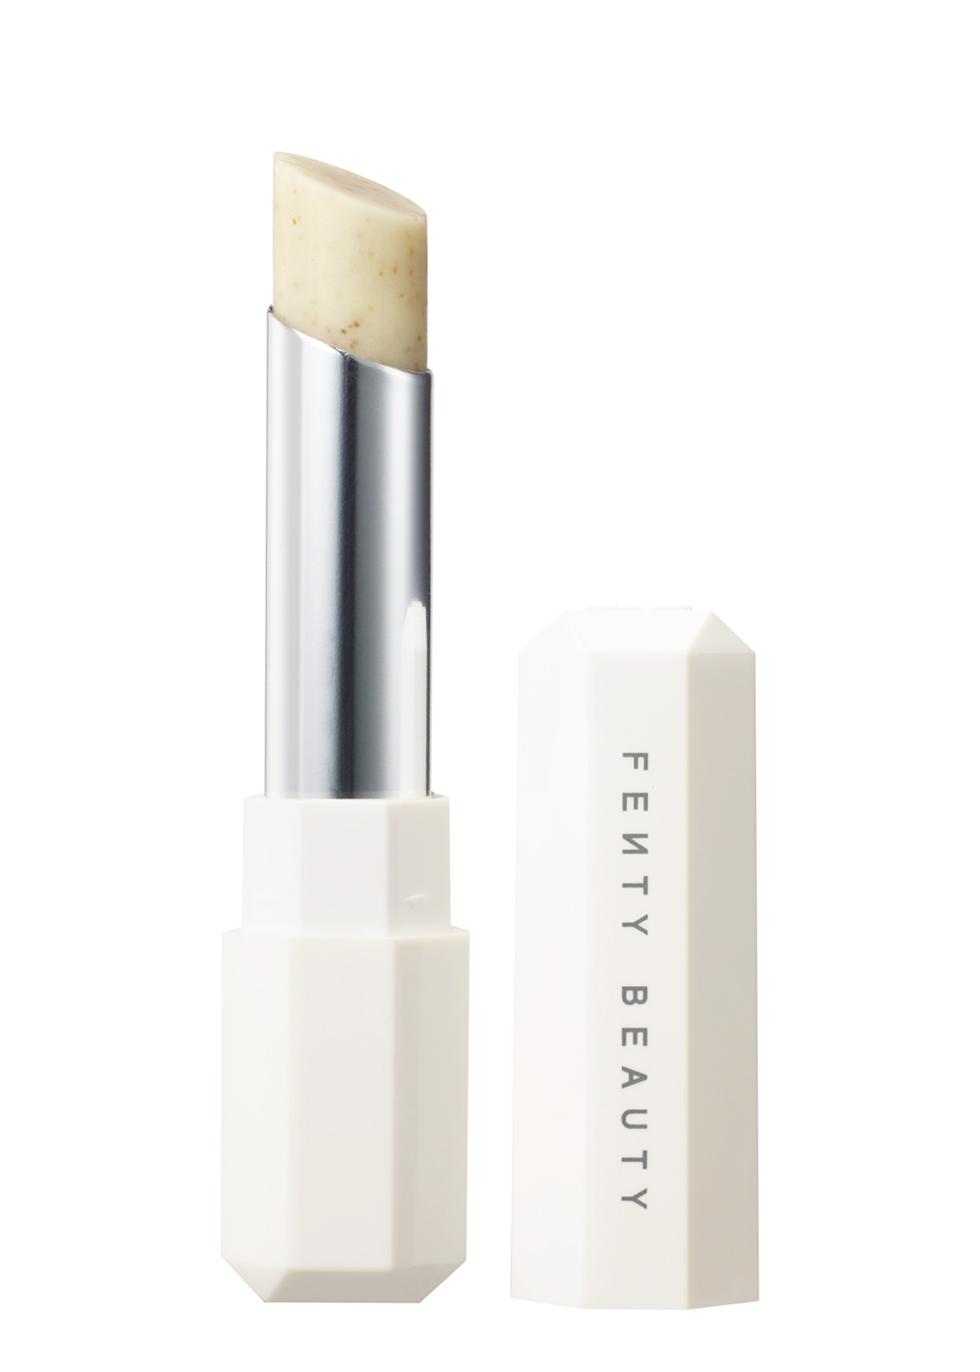 Rihanna Beauty Collection Fenty Makeup Harvey Nichols